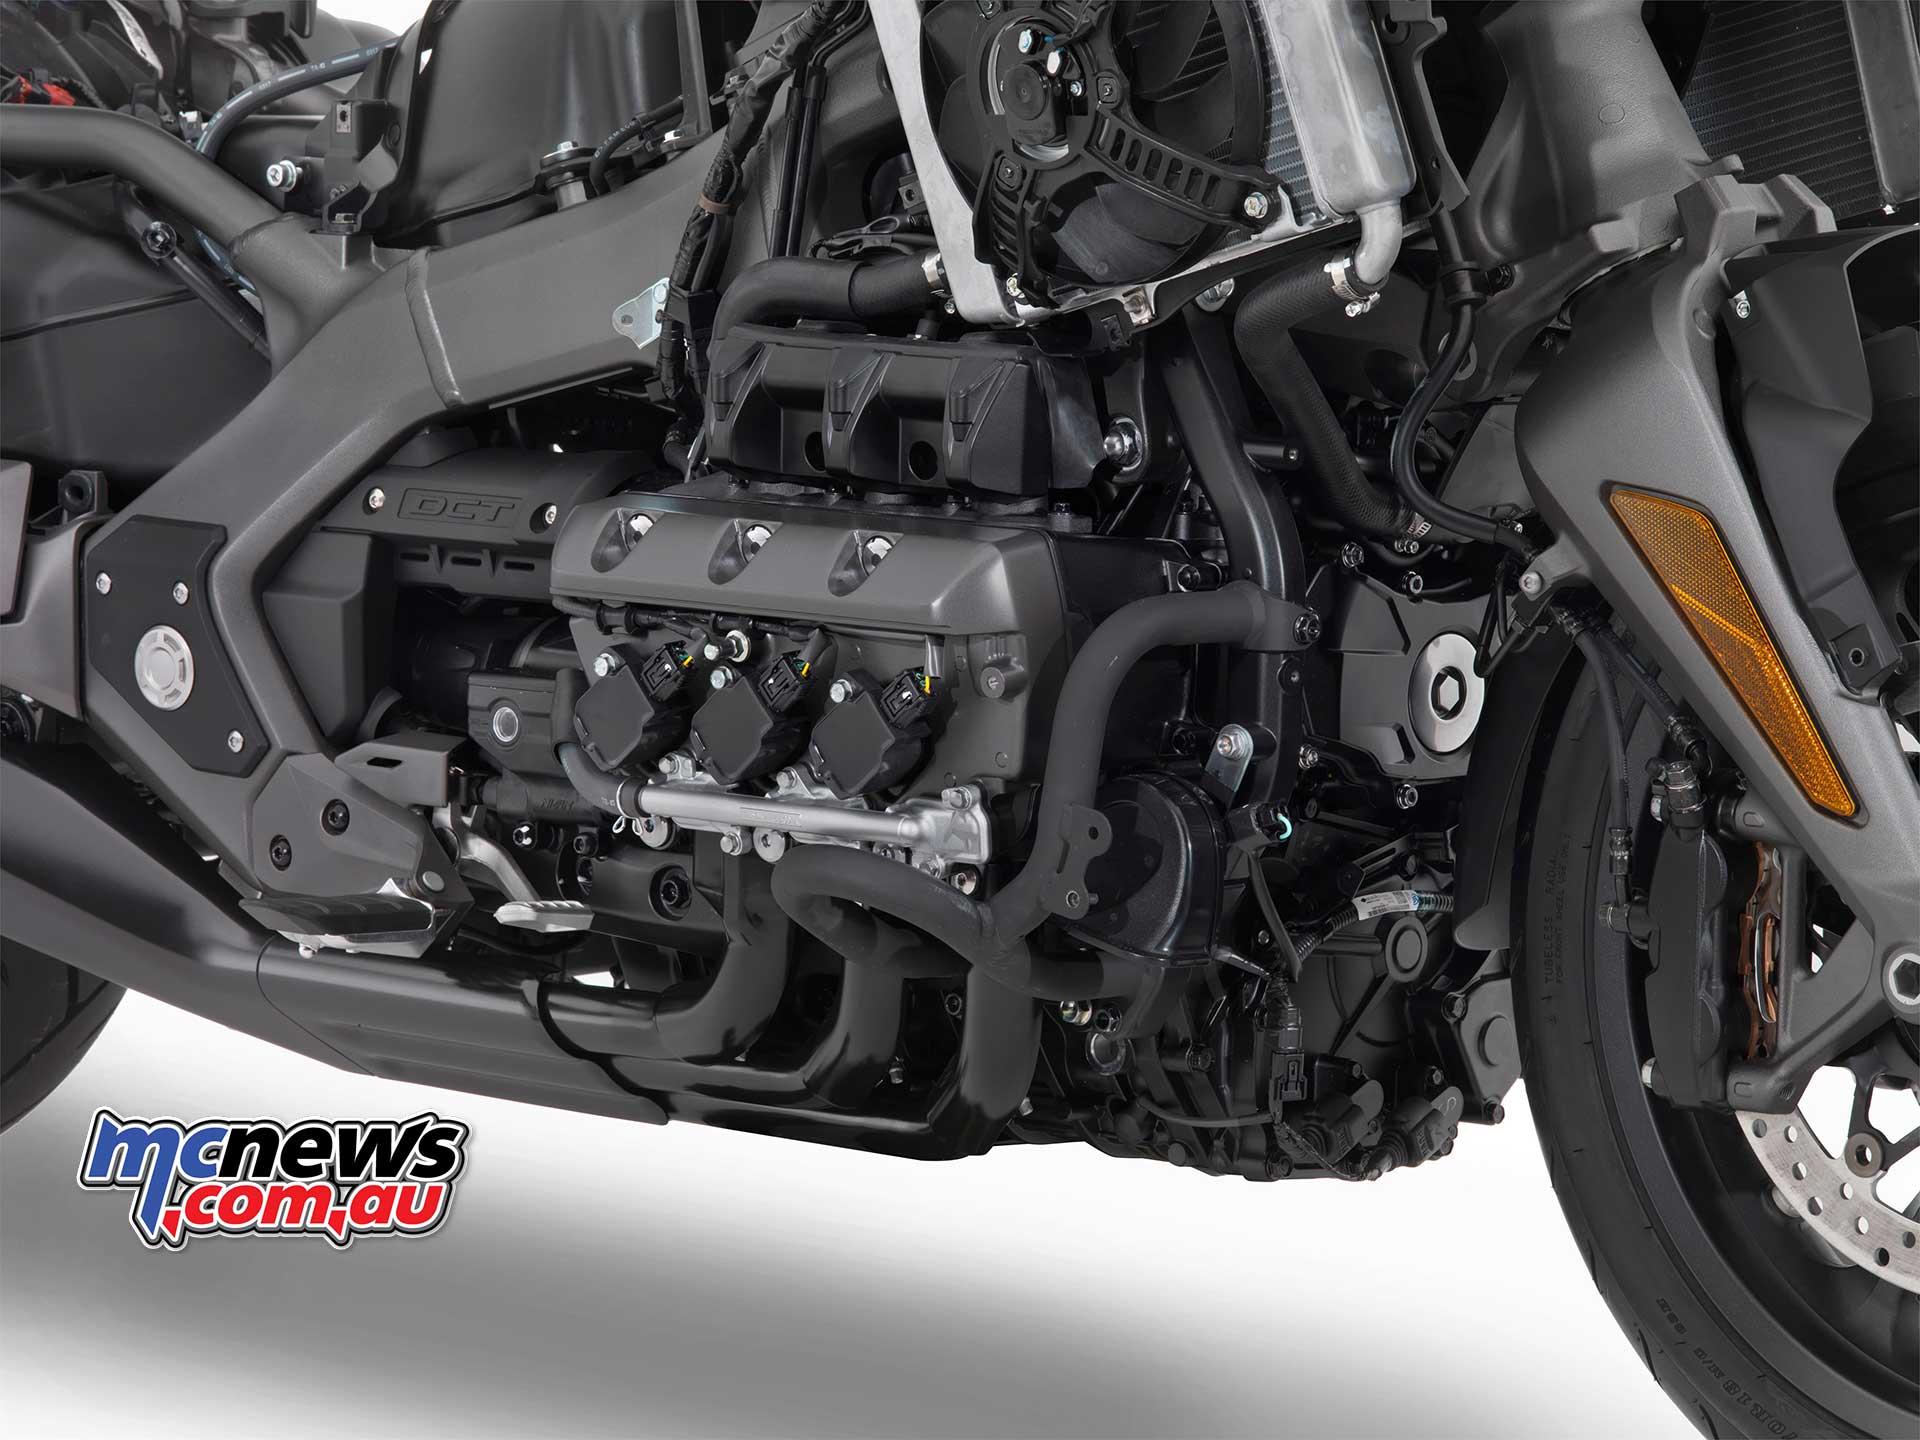 2018 Honda Gold Wing 48kg Lighter Full Details Mcnewscomau